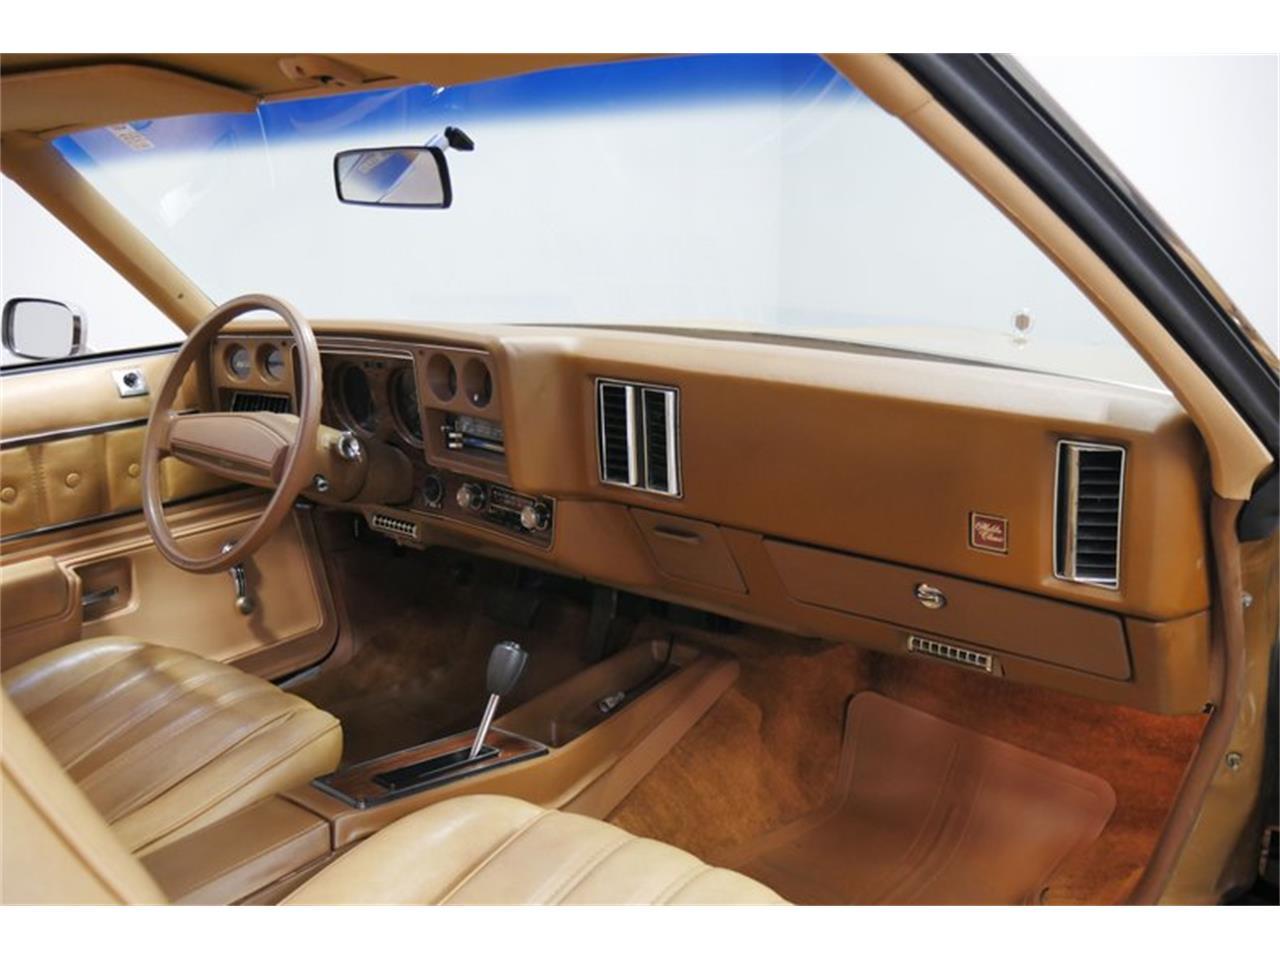 1977 Chevrolet Malibu (CC-1361521) for sale in Lavergne, Tennessee